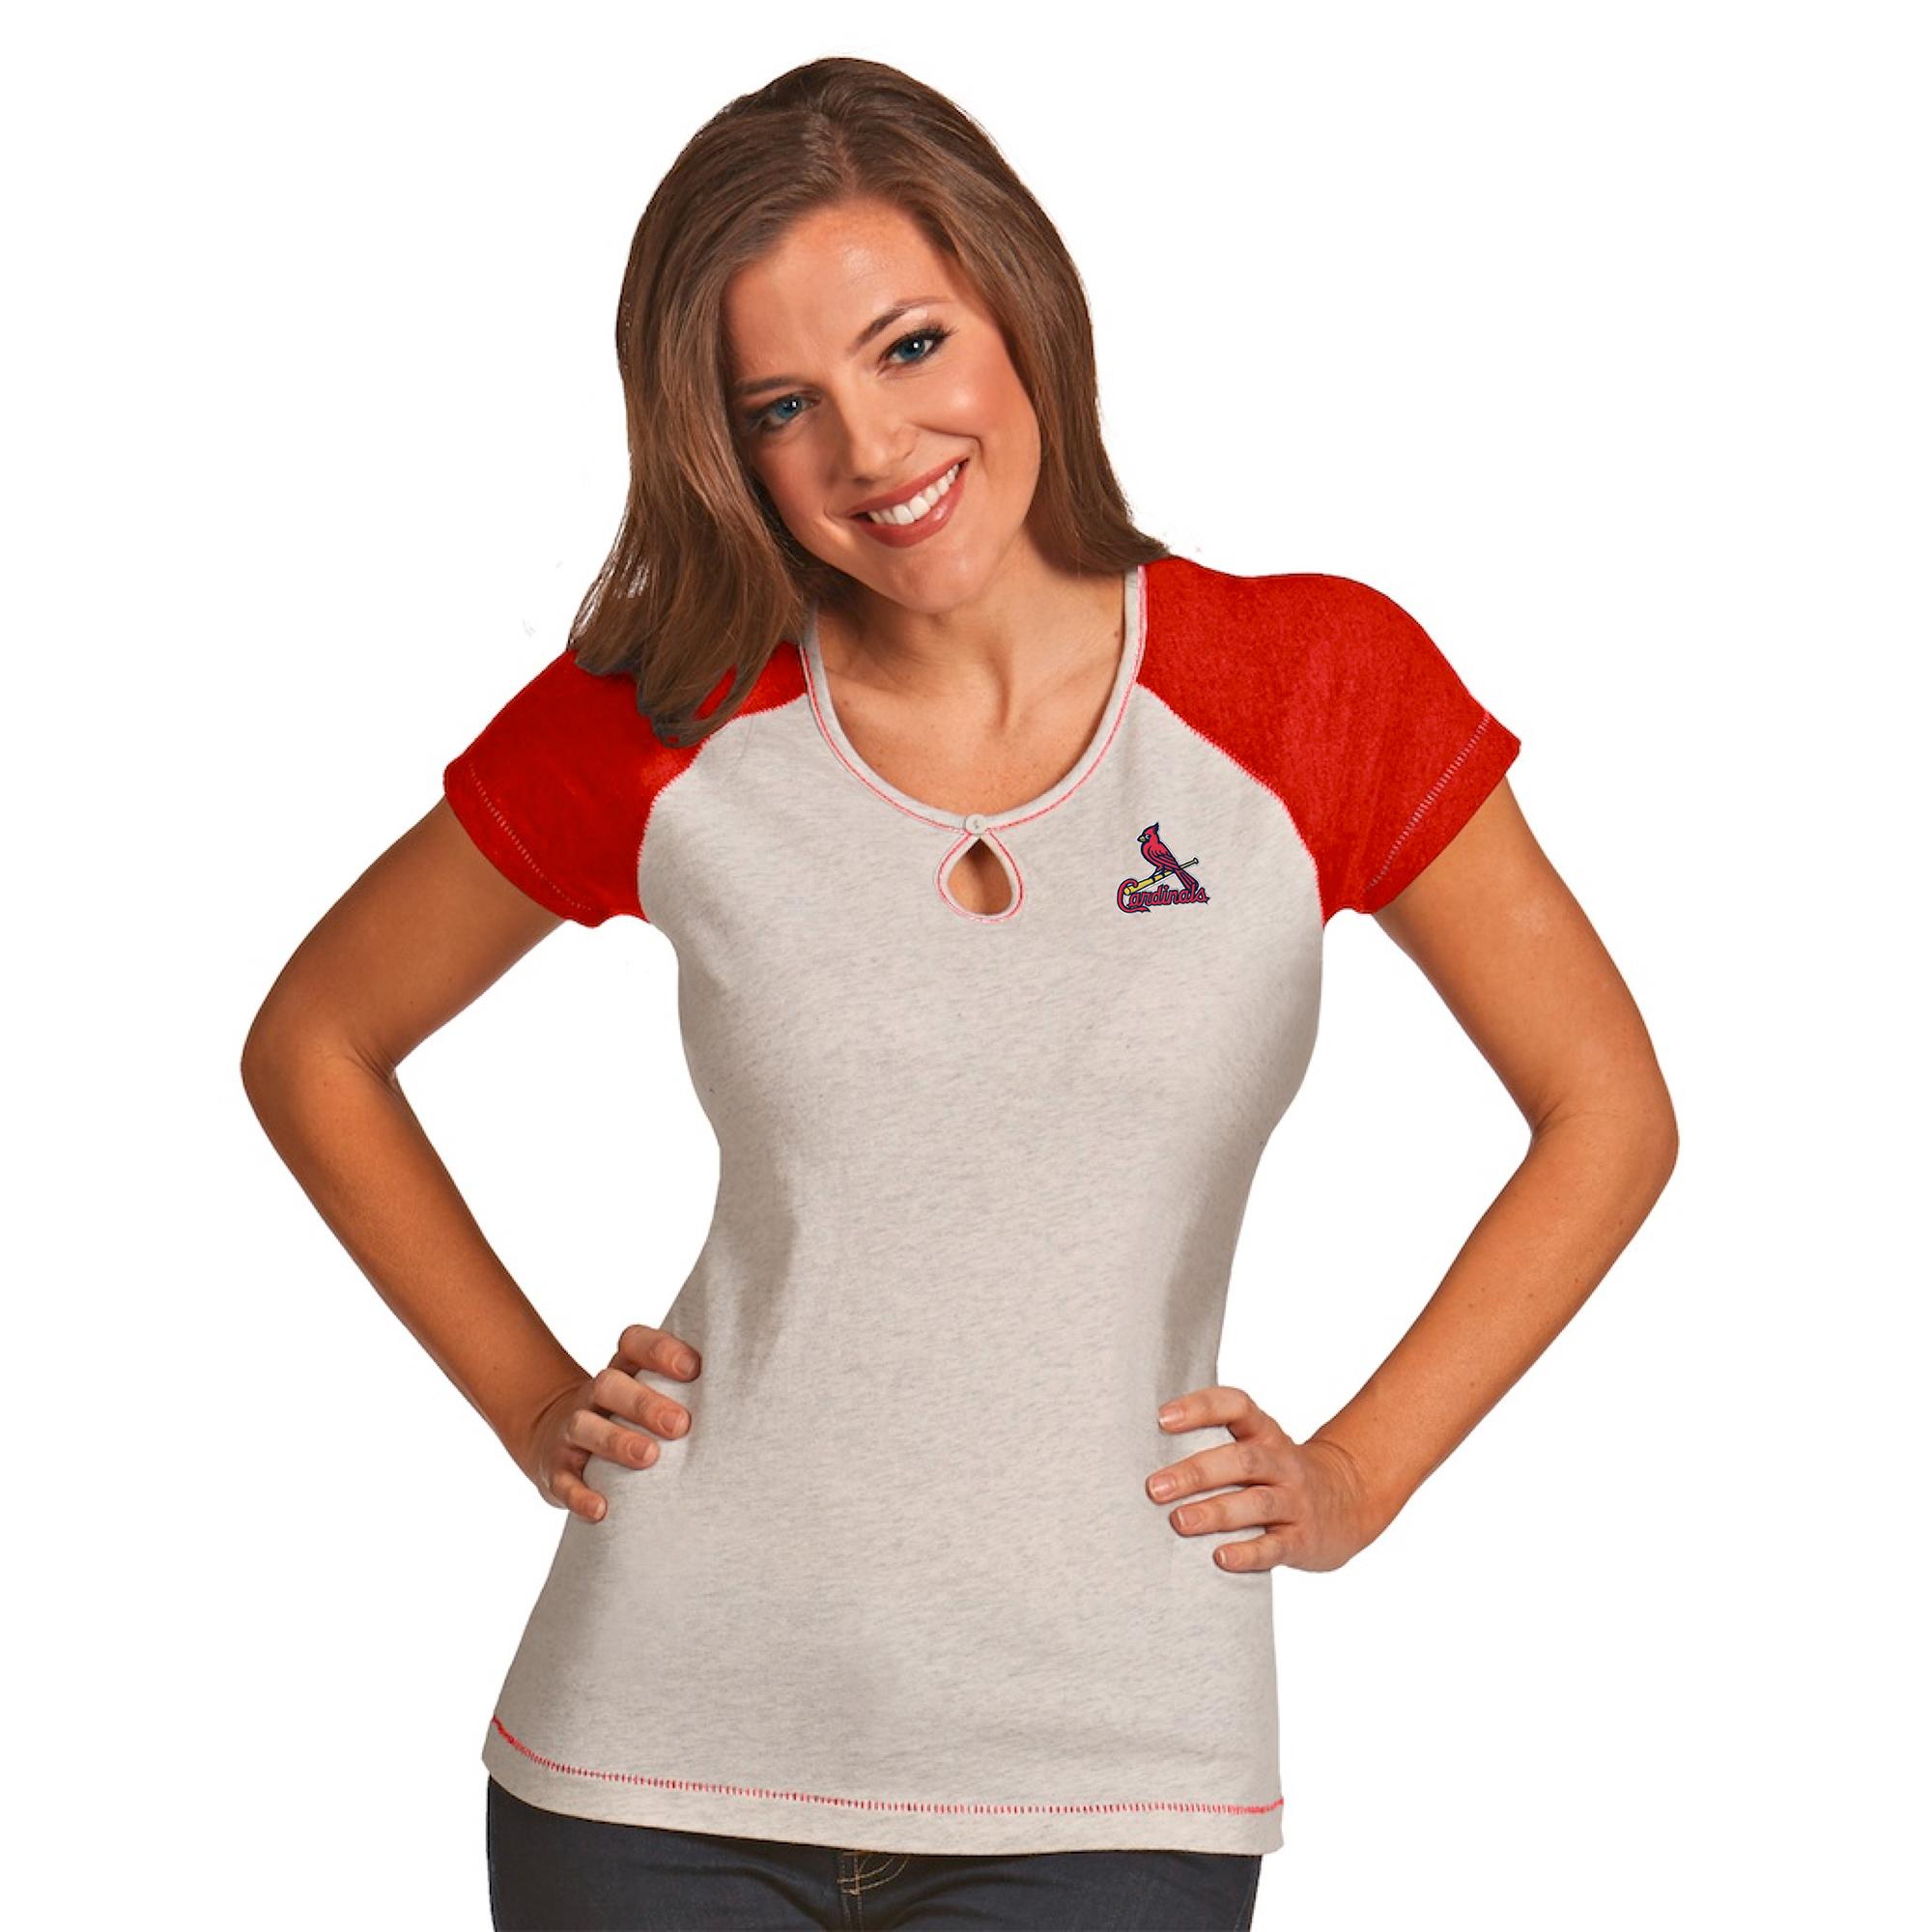 St. Louis Cardinals Antigua Women's Crush T-Shirt - White/Heather Red